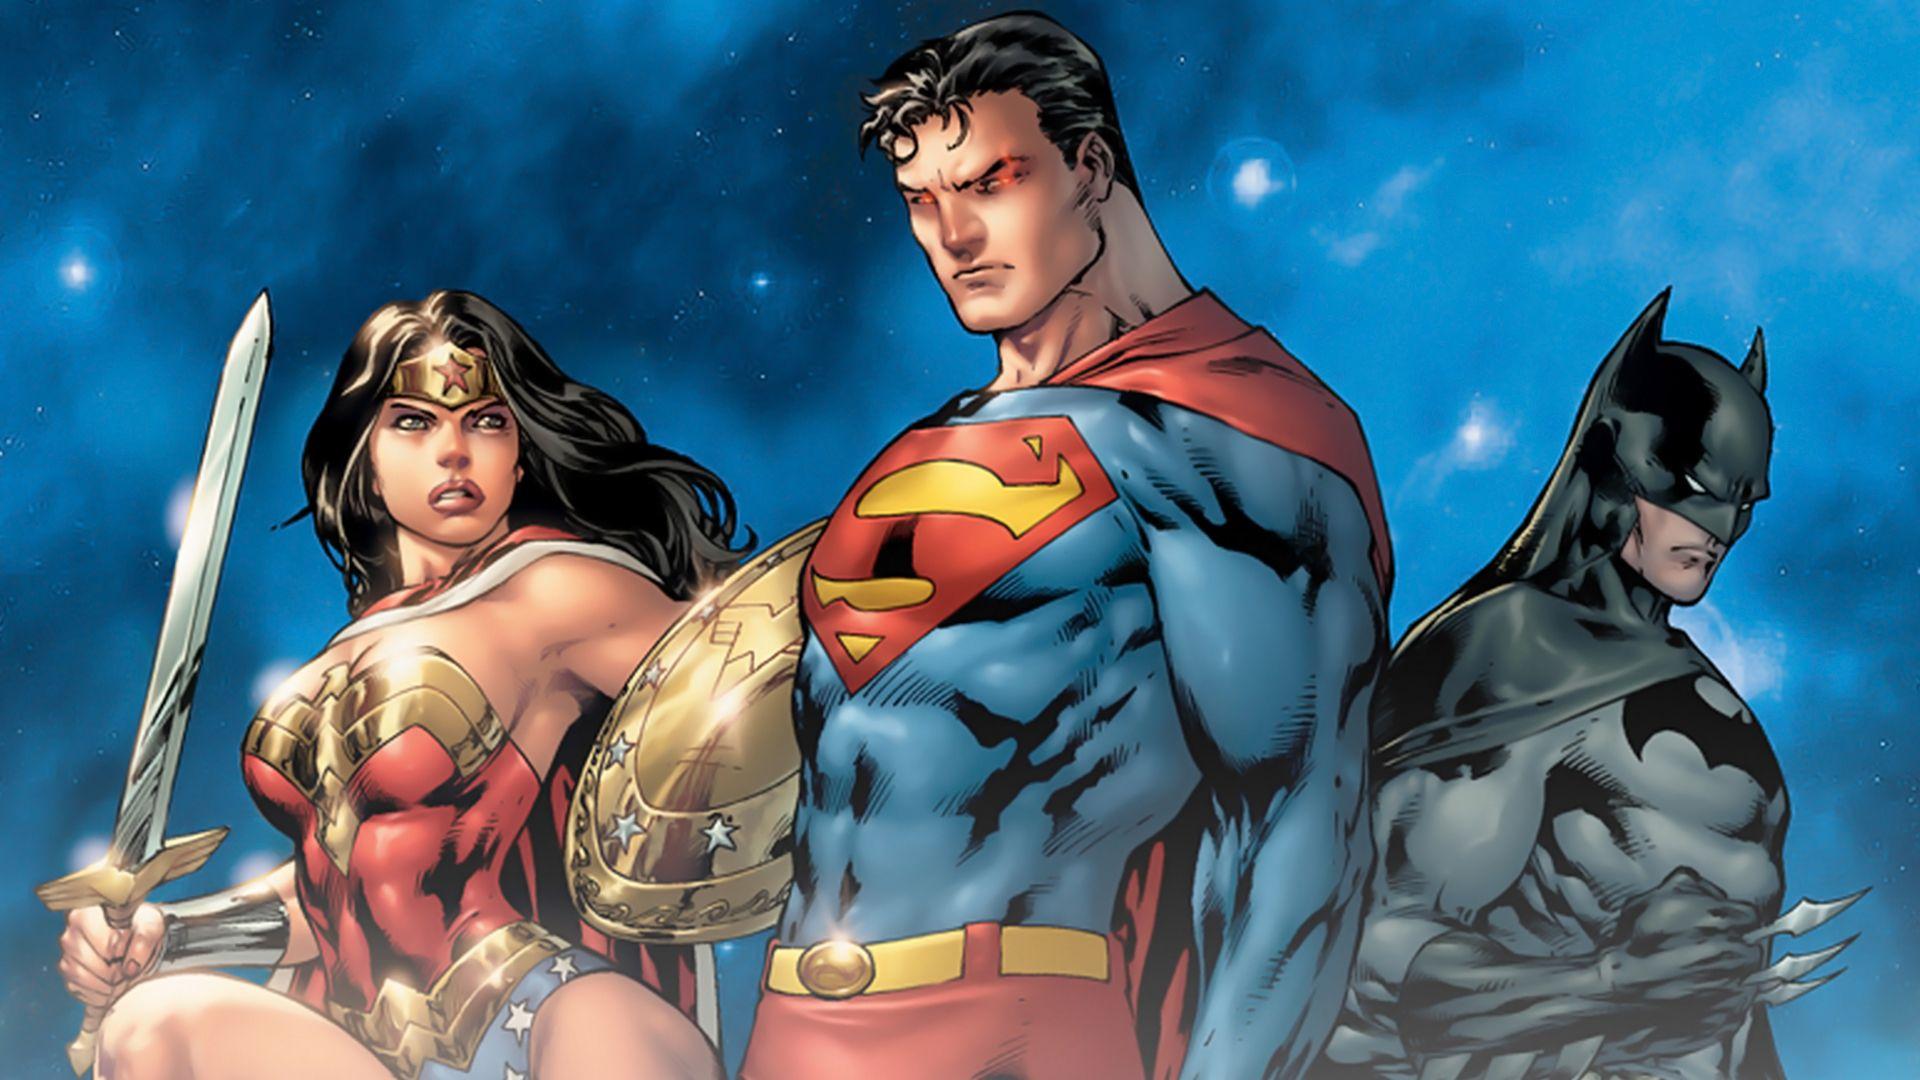 Dc universe online legends batman superman and wonder woman by ed benes visit to grab an amazing super hero shirt now on sale